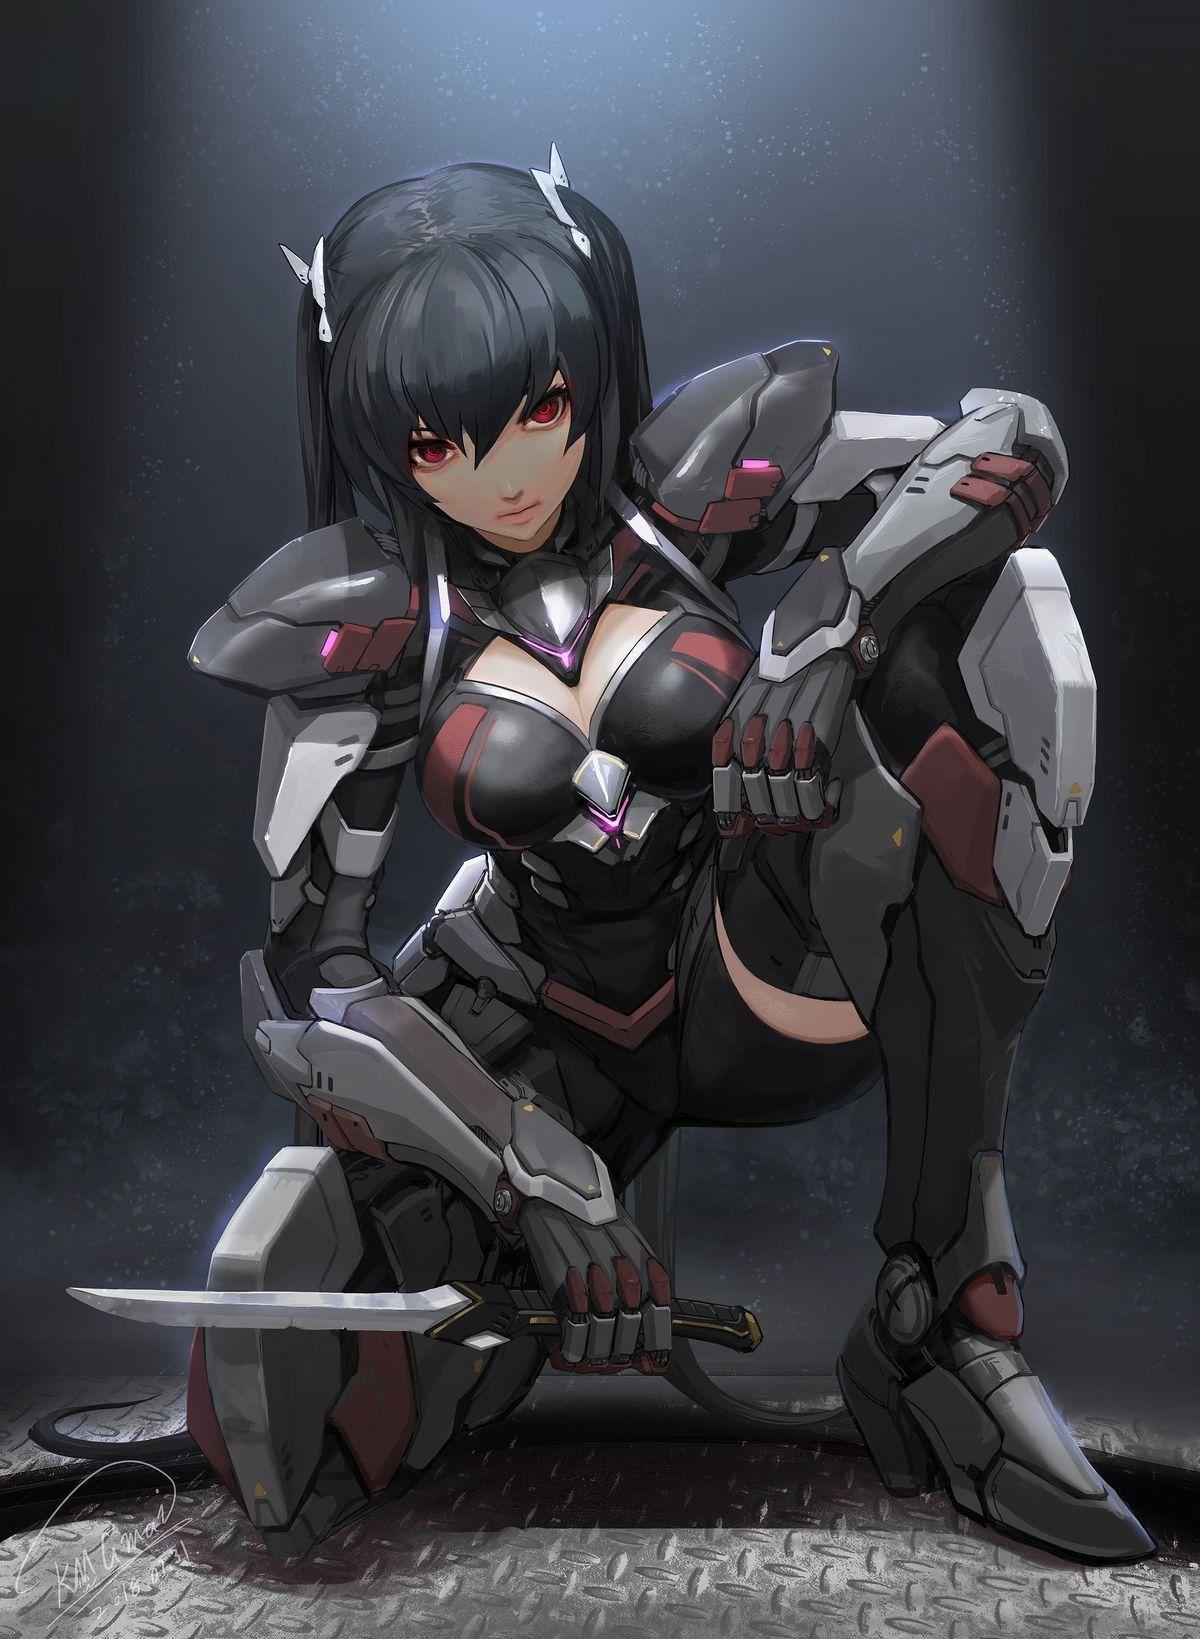 Anime Fanart Collection Hd Vol Xiv Mecha Mecha Girls Album On Imgur Cyberpunk Art Character Art Cyborg Anime